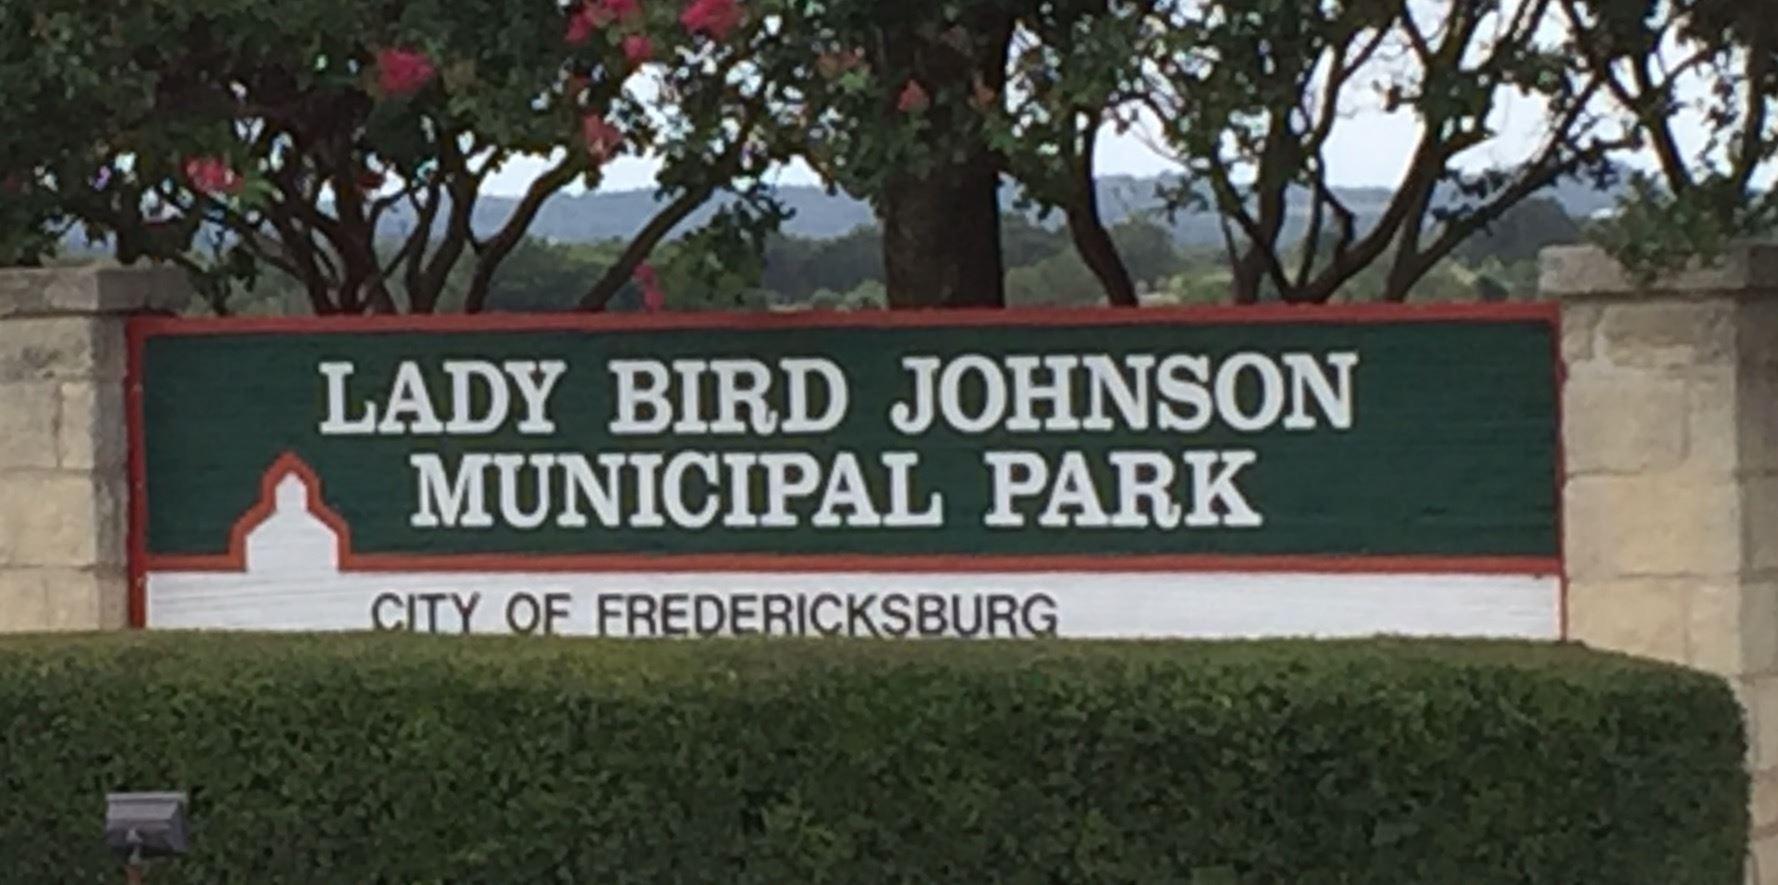 Lady Bird Johnson Municipal Park Campground   Fredericksburg, TX